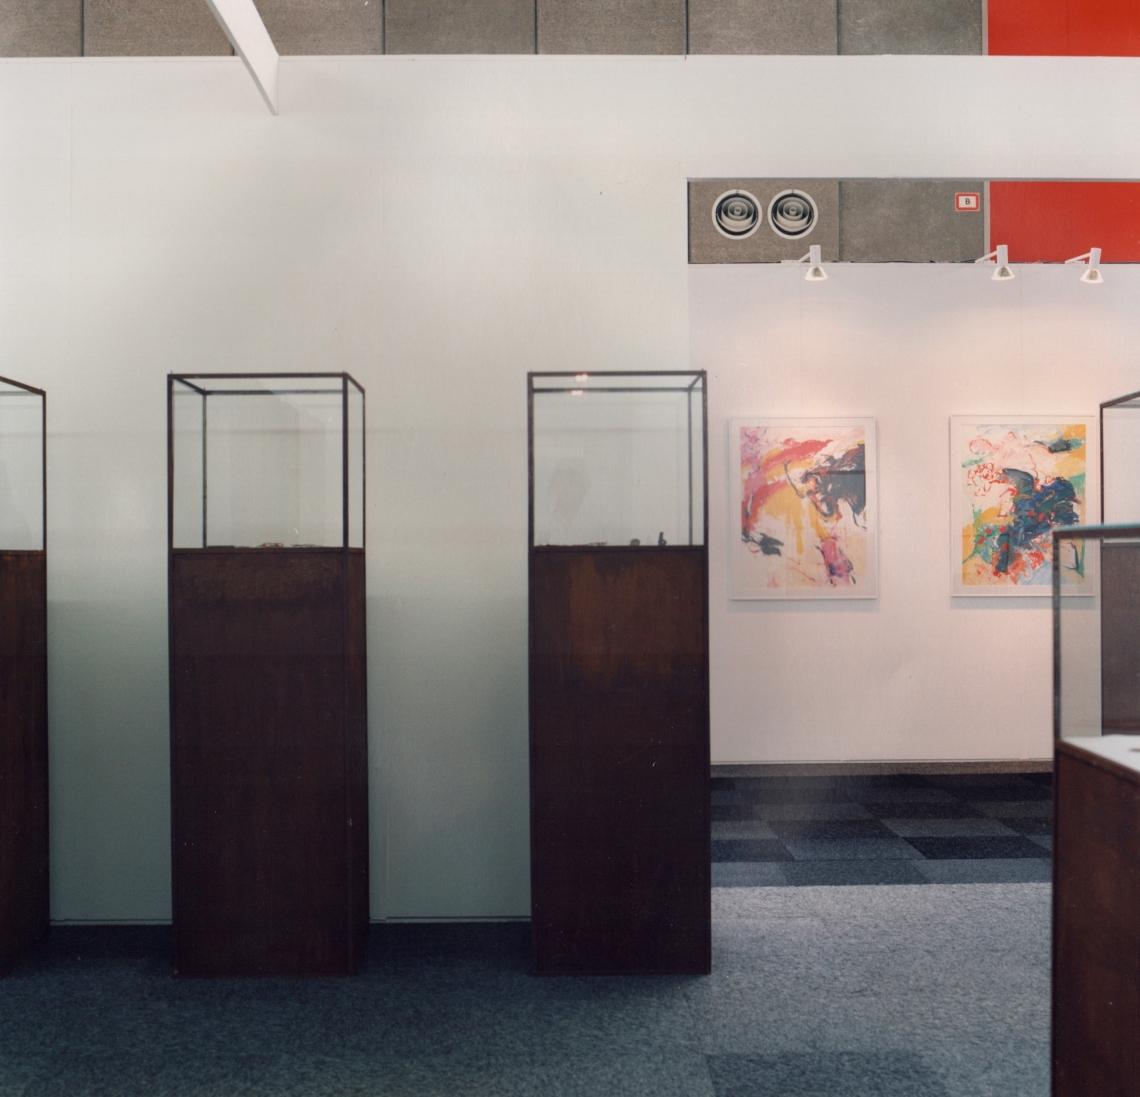 Galerie Louise Smit op KunstRAI 1989. Foto met dank aan Louise Smit©